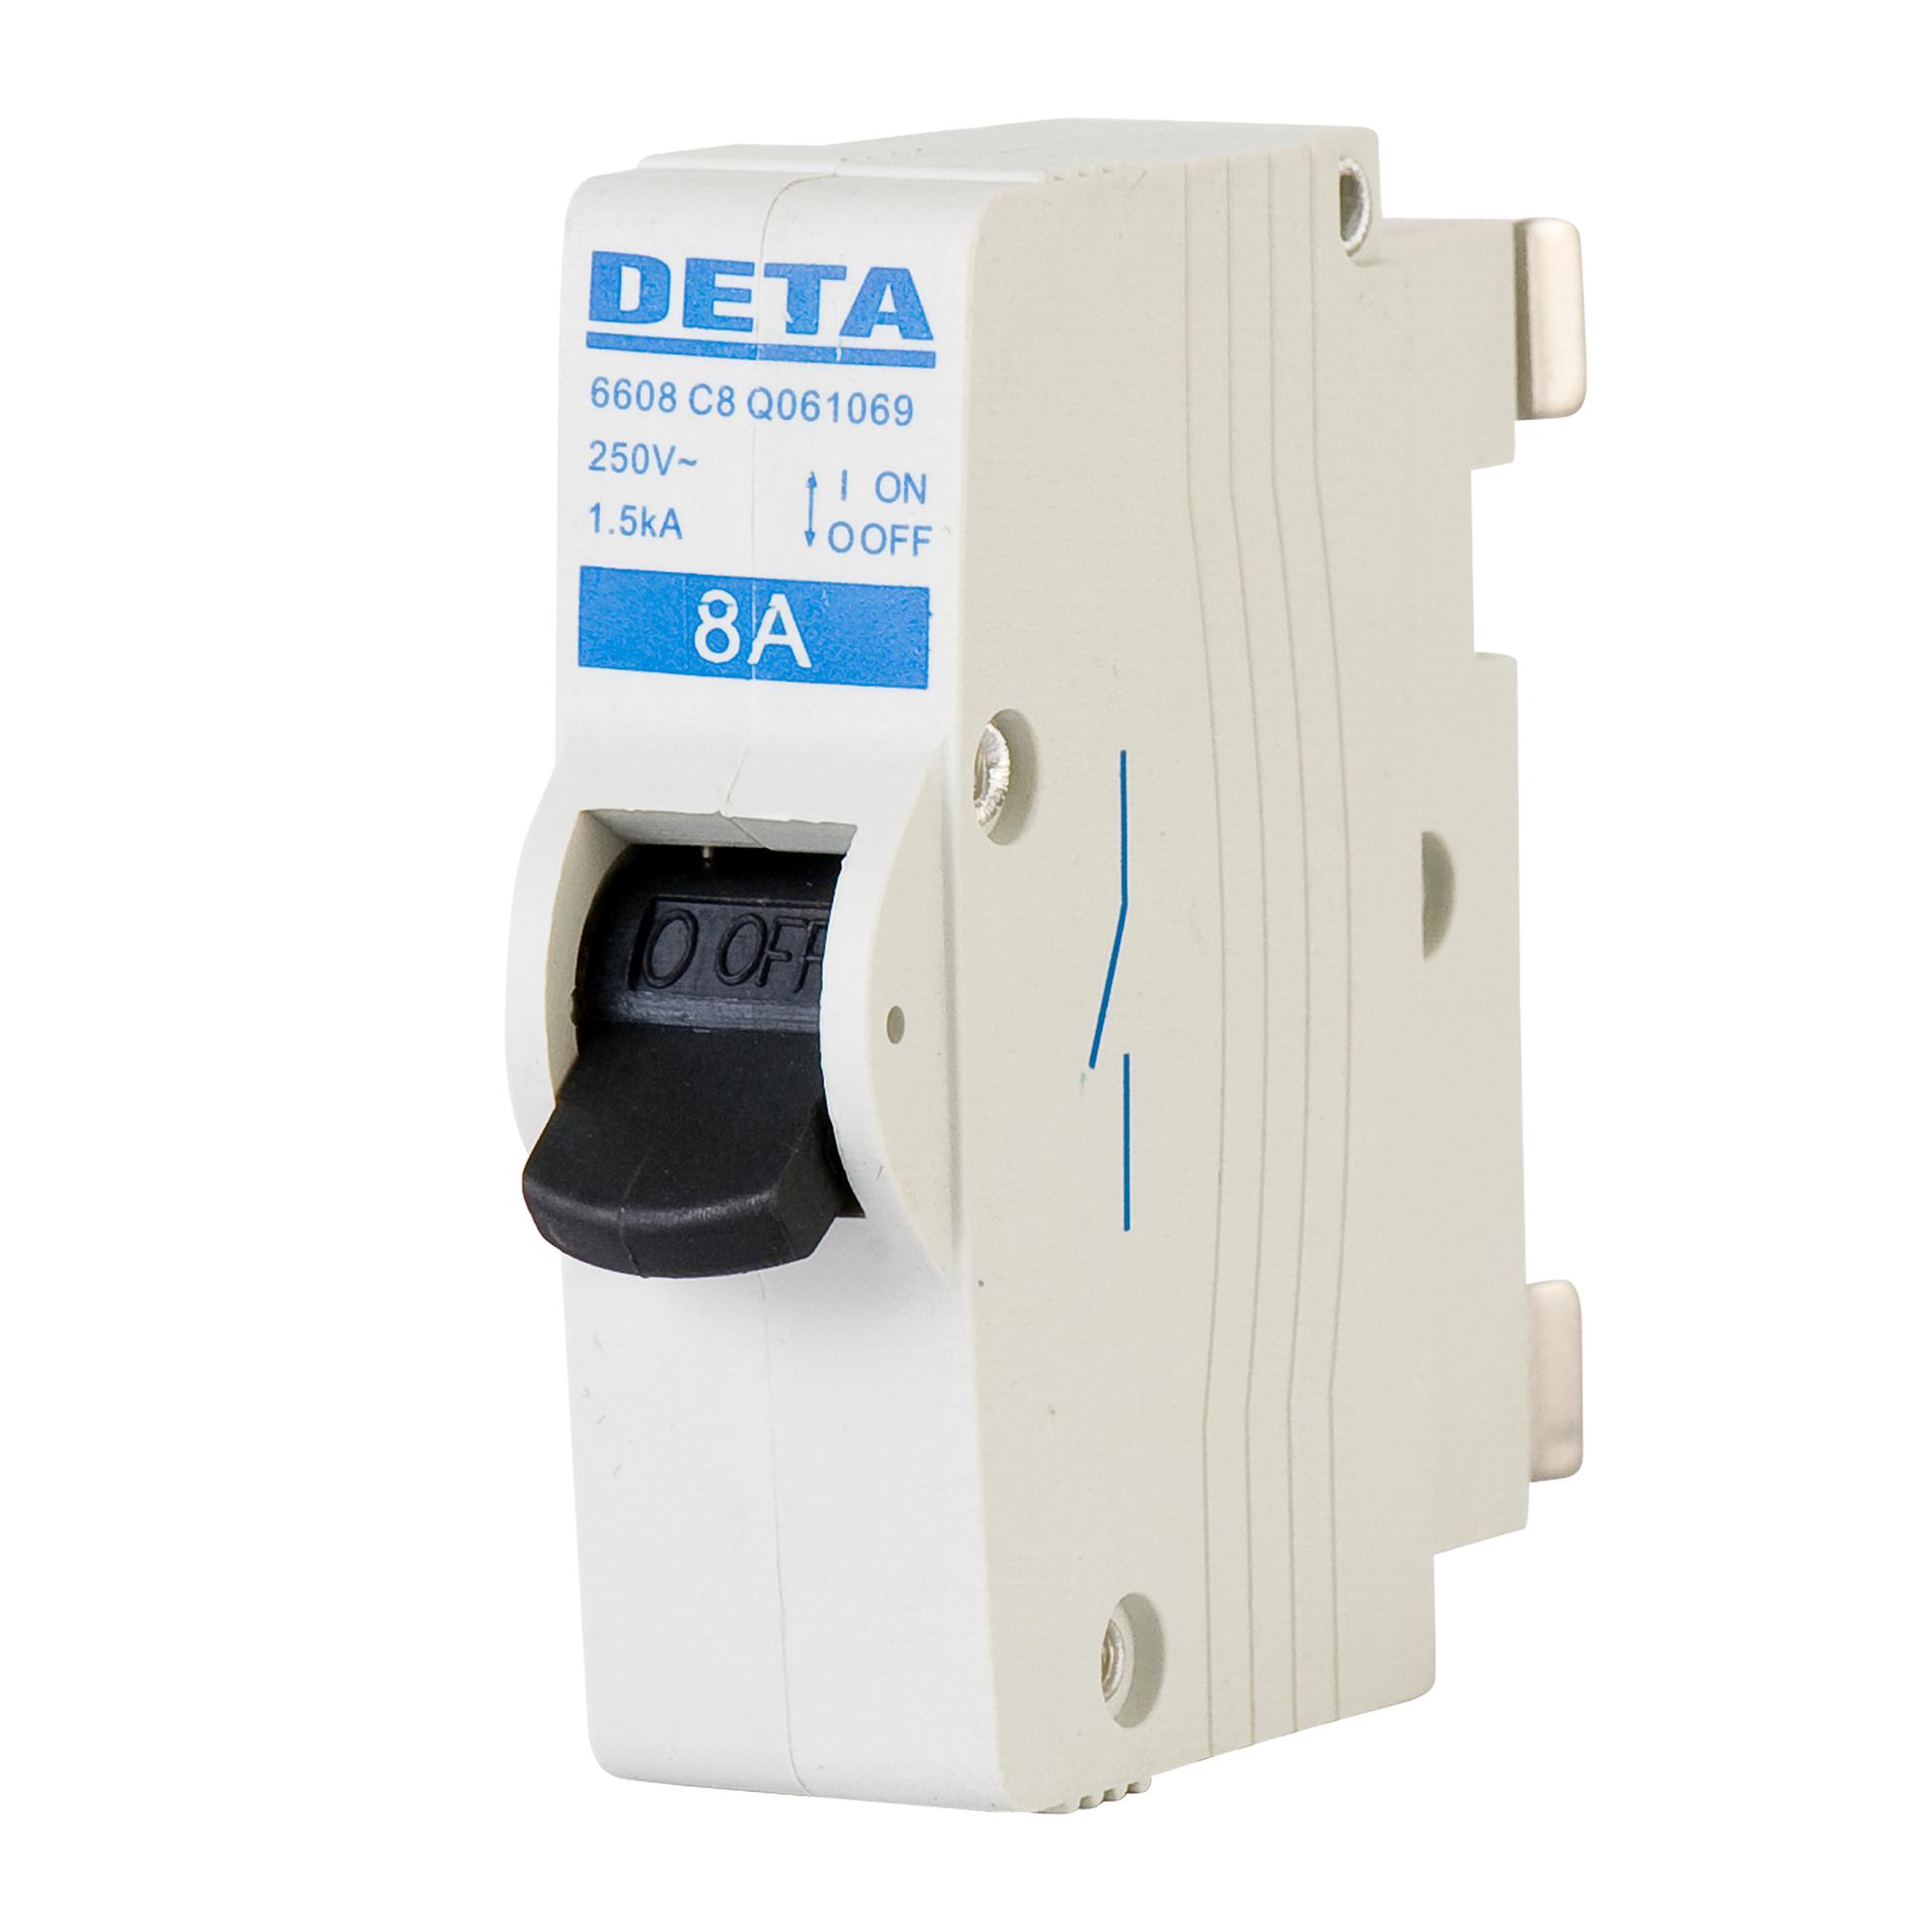 8a plug-in circuit breaker